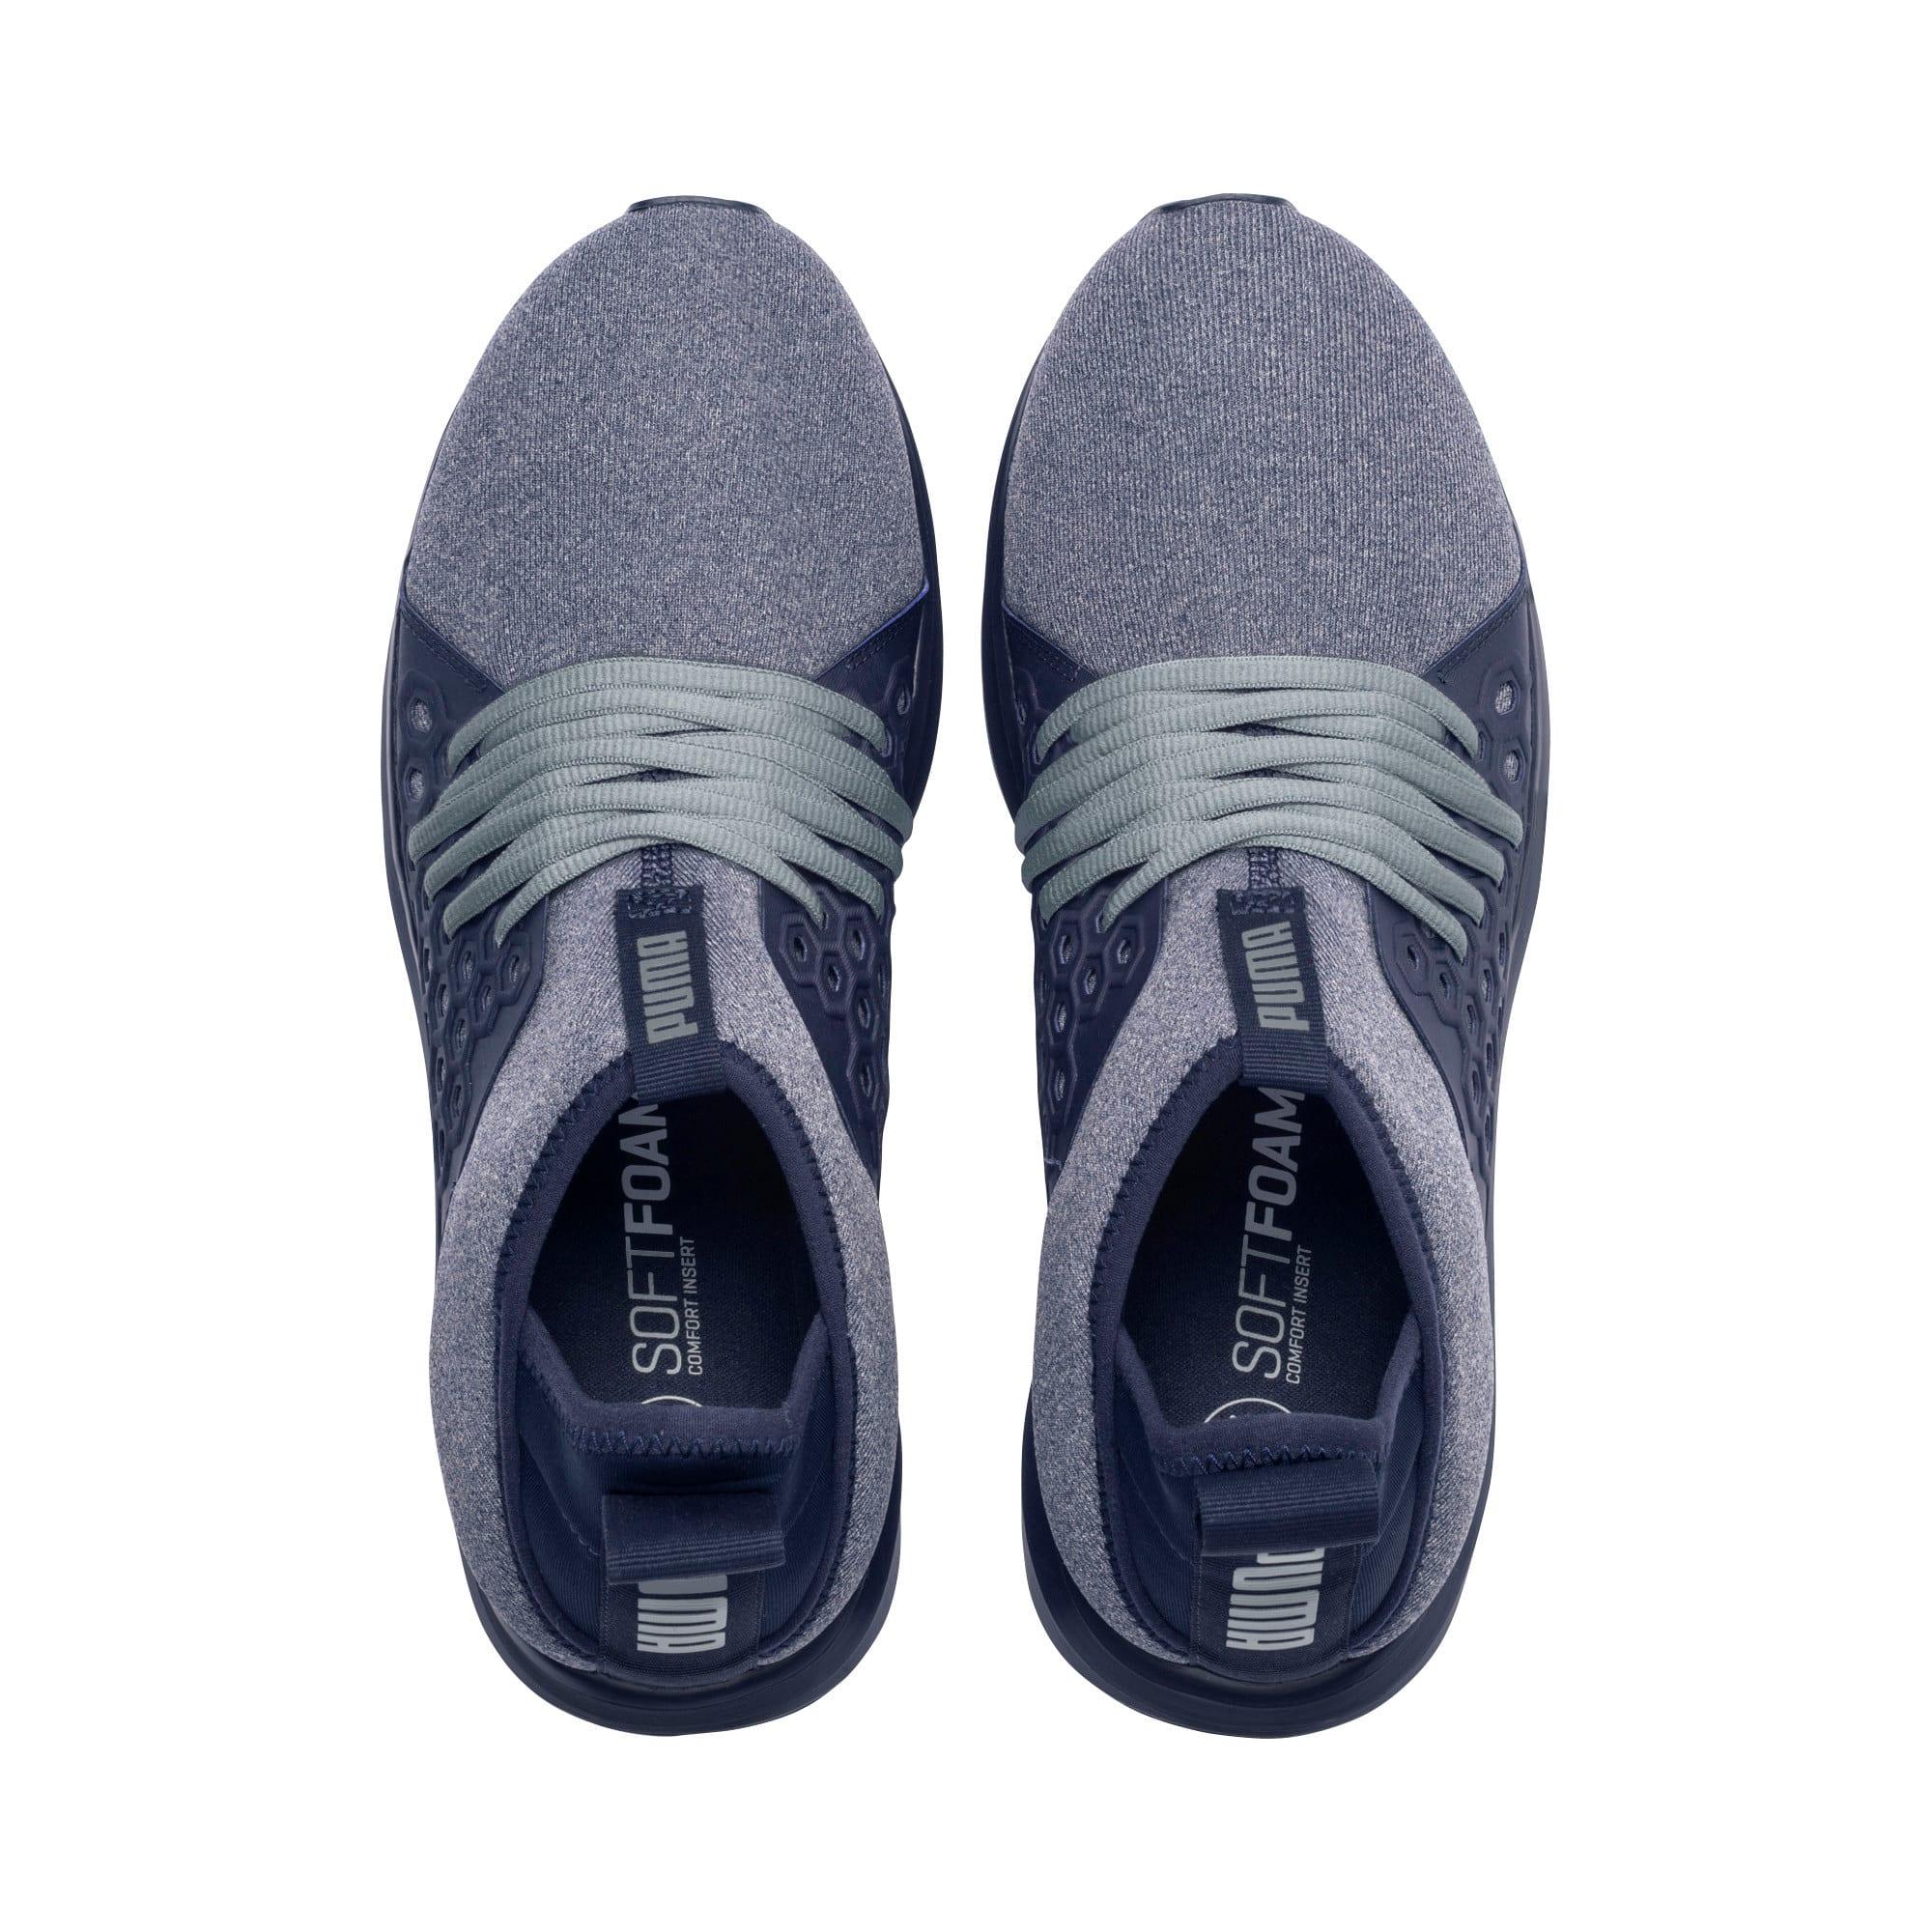 Thumbnail 6 of Enzo NF Mid Men's Training Shoes, Peacoat-Quarry, medium